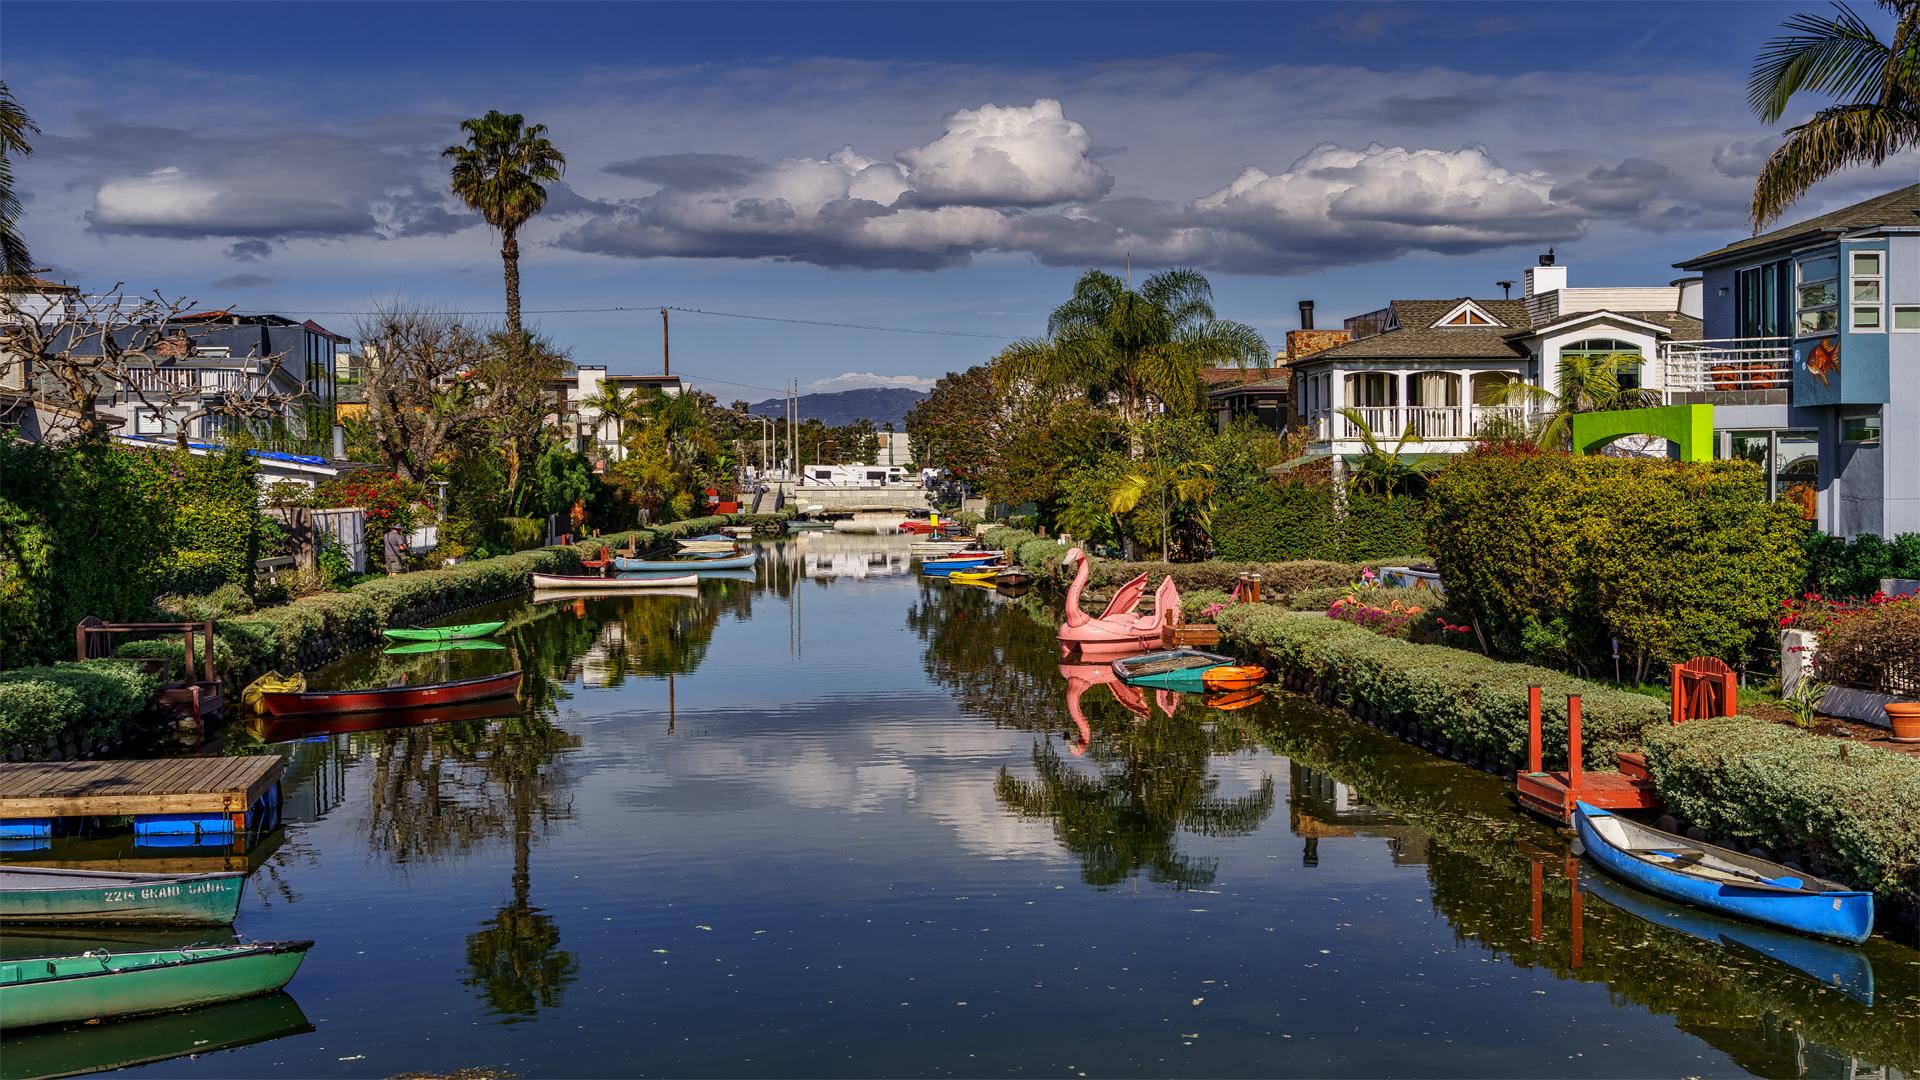 Venice Beach Canals8 2-14-18